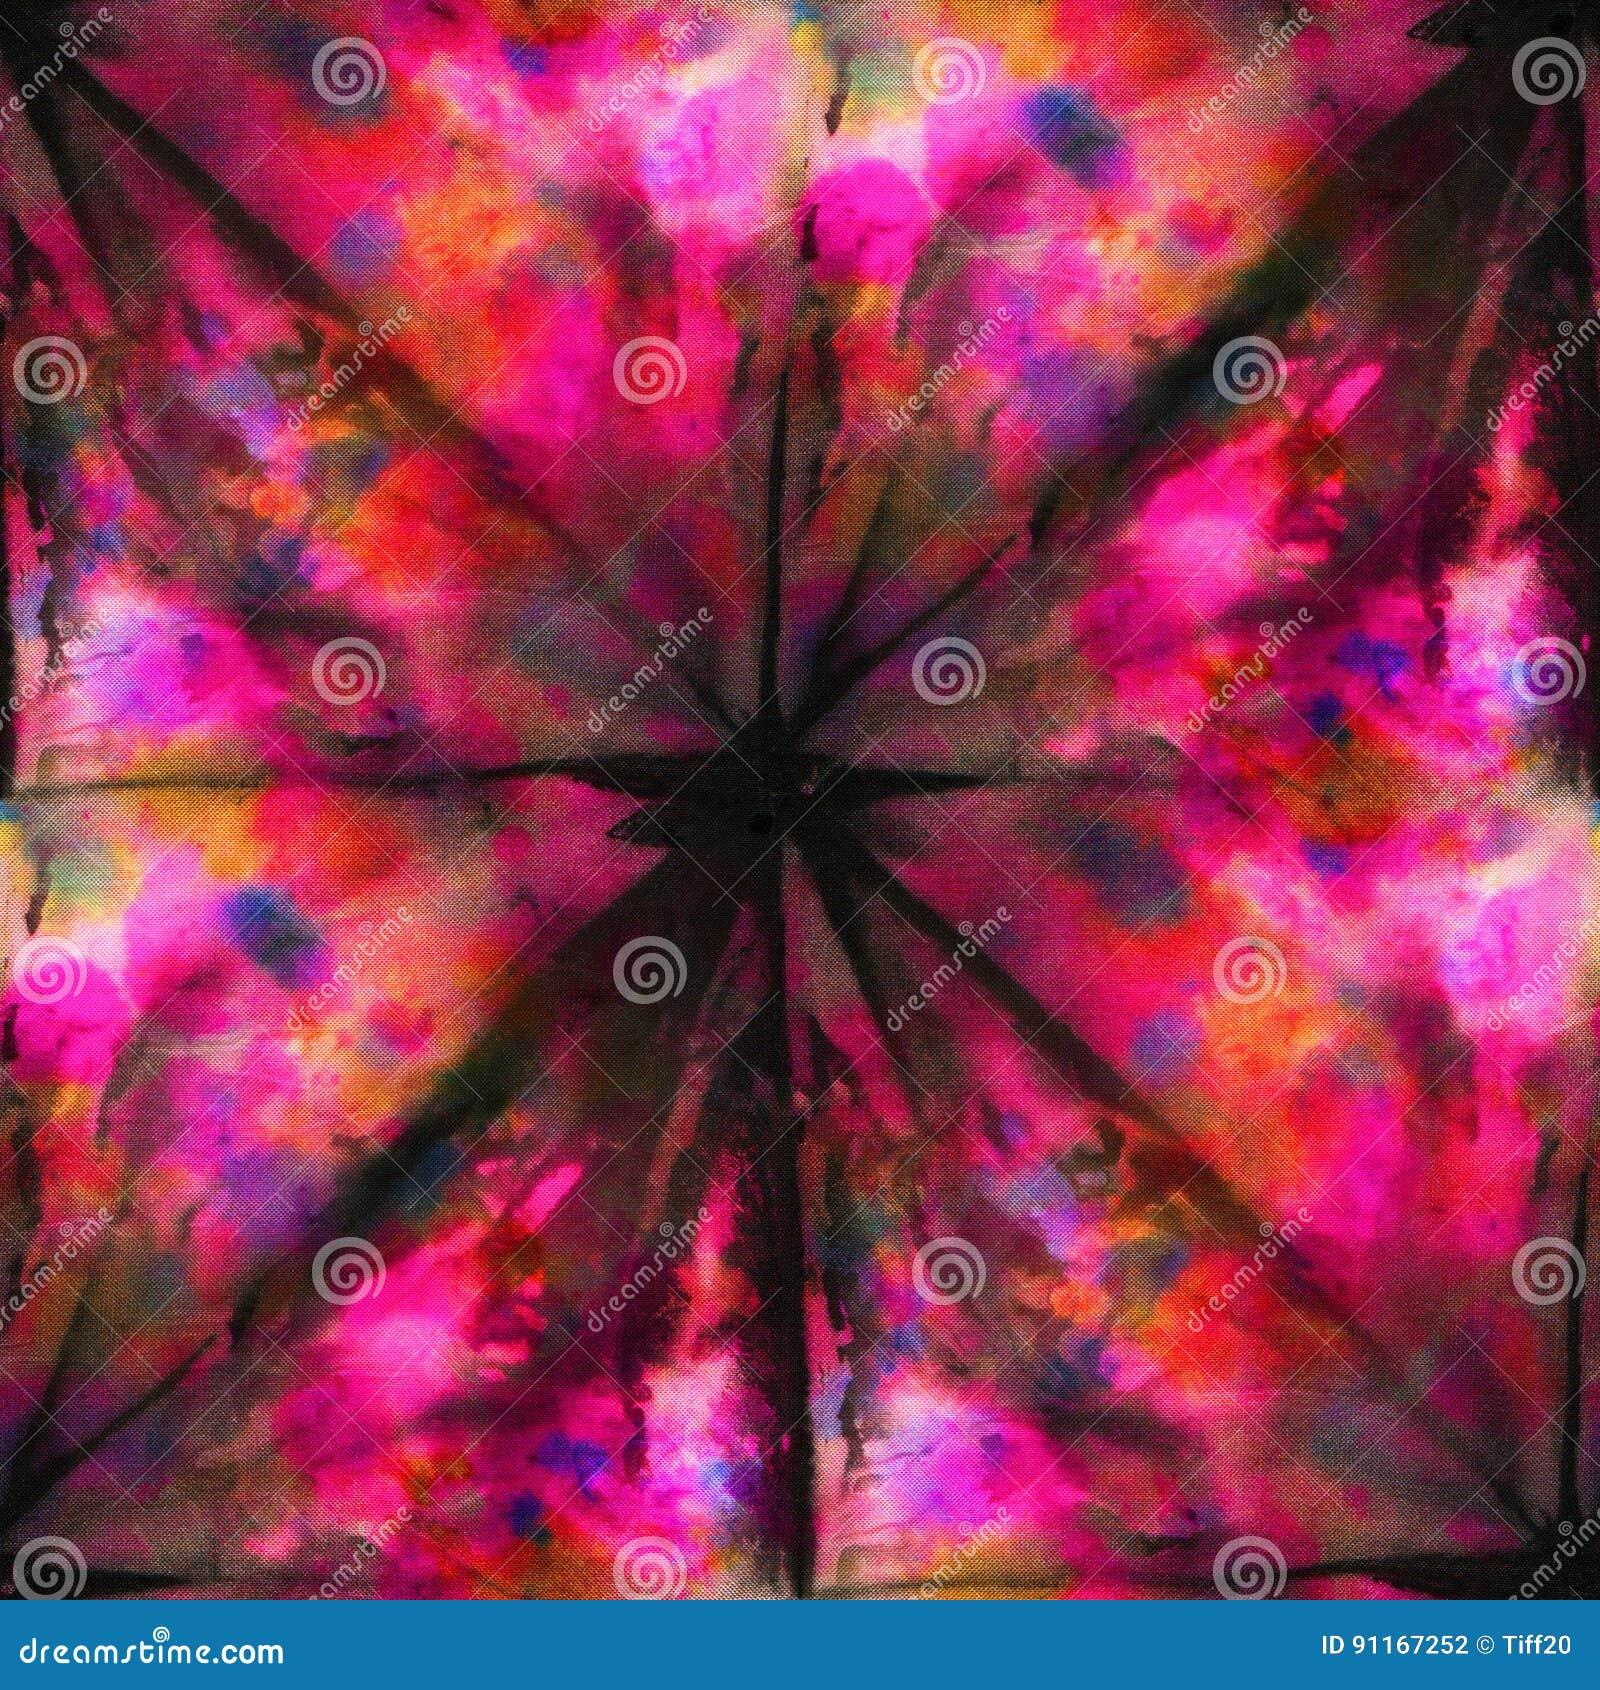 e317d441f4f1 Seamless tie-dye pattern of black and red color on white silk. Hand painting  fabrics - nodular batik. Shibori dyeing.